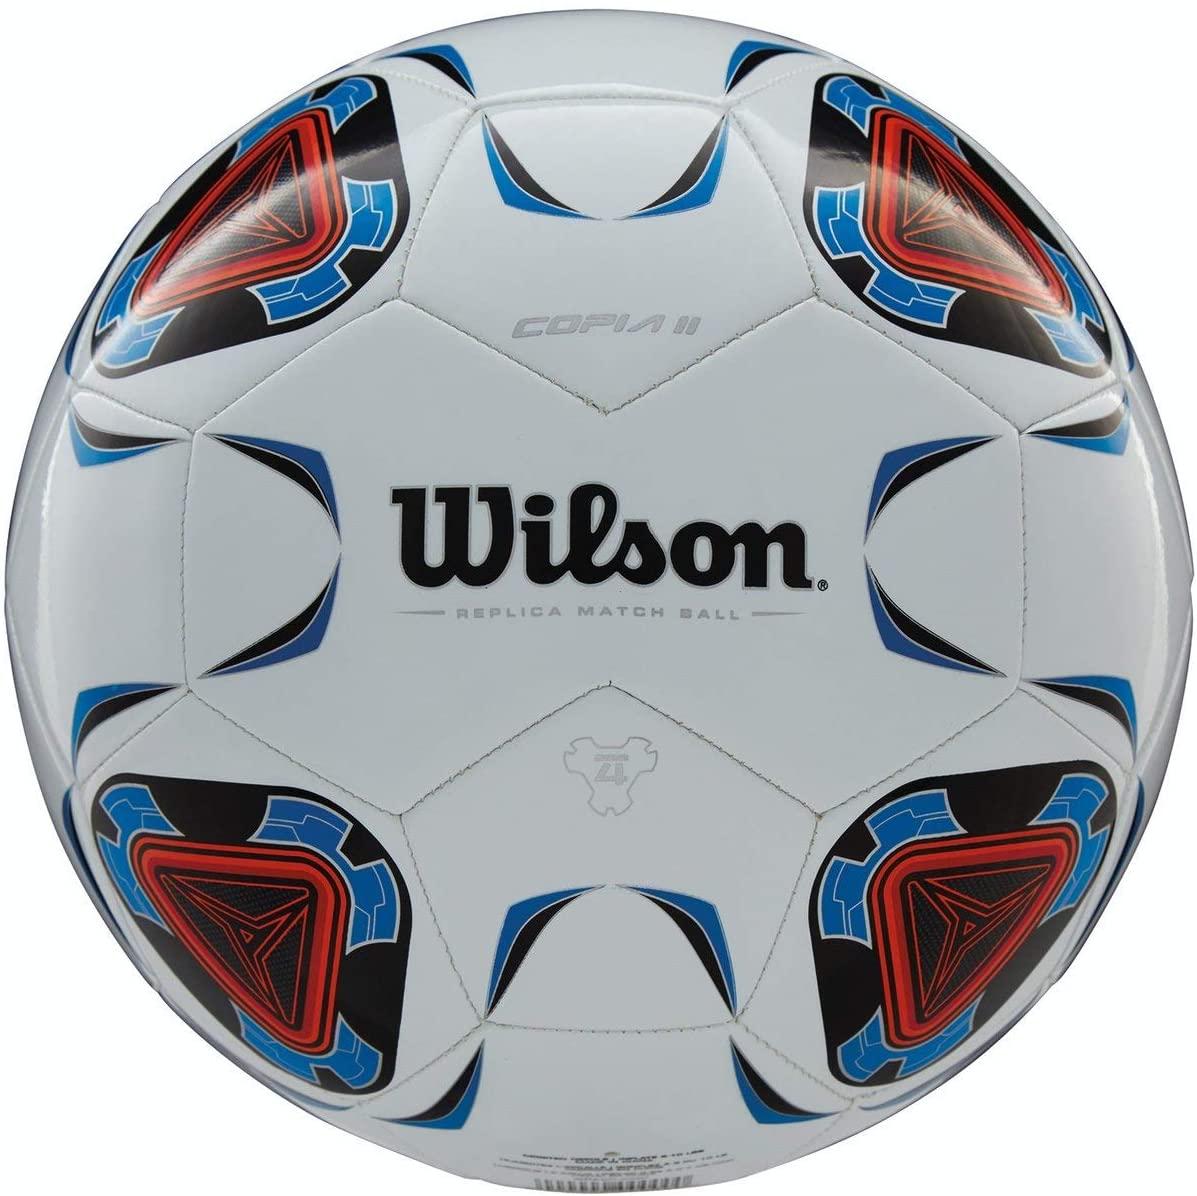 Wilson Copia ll Soccer Ball